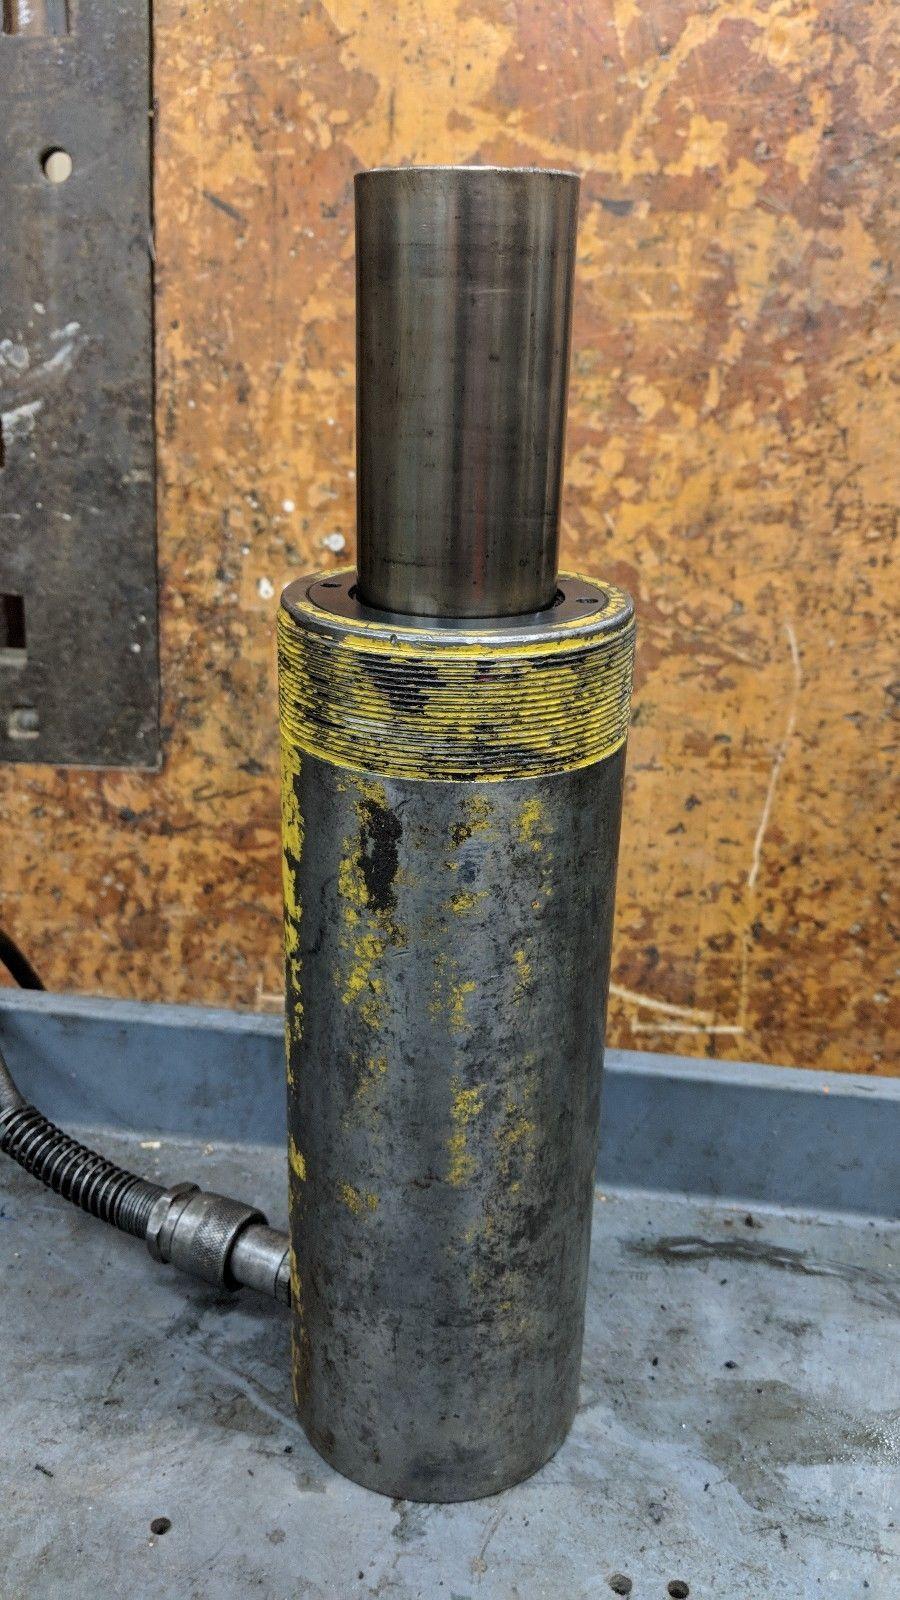 "ENERPAC RCH-306 Hydraulic Hollow Cylinder, 30 tons, 6-1/8"".Stroke"